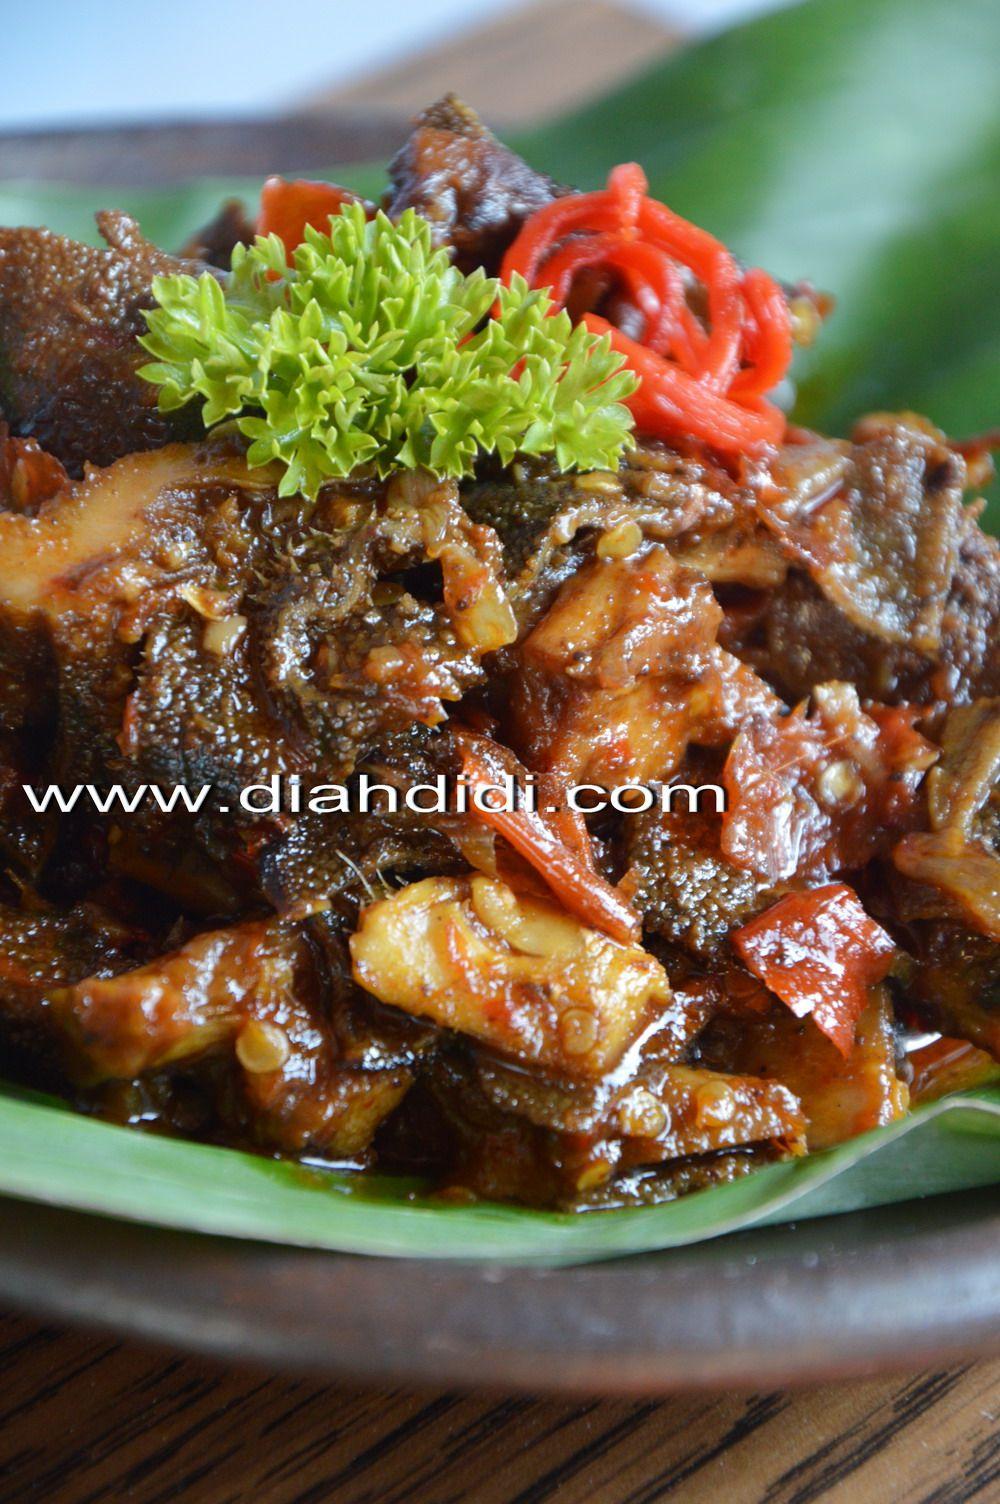 Diah Didi S Kitchen Inspirasi Menu Buka Puasa Sahur Hari Ke 23 Babat Gongso Versi Praktis Semarang Resep Masakan Resep Daging Resep Ayam Sehat